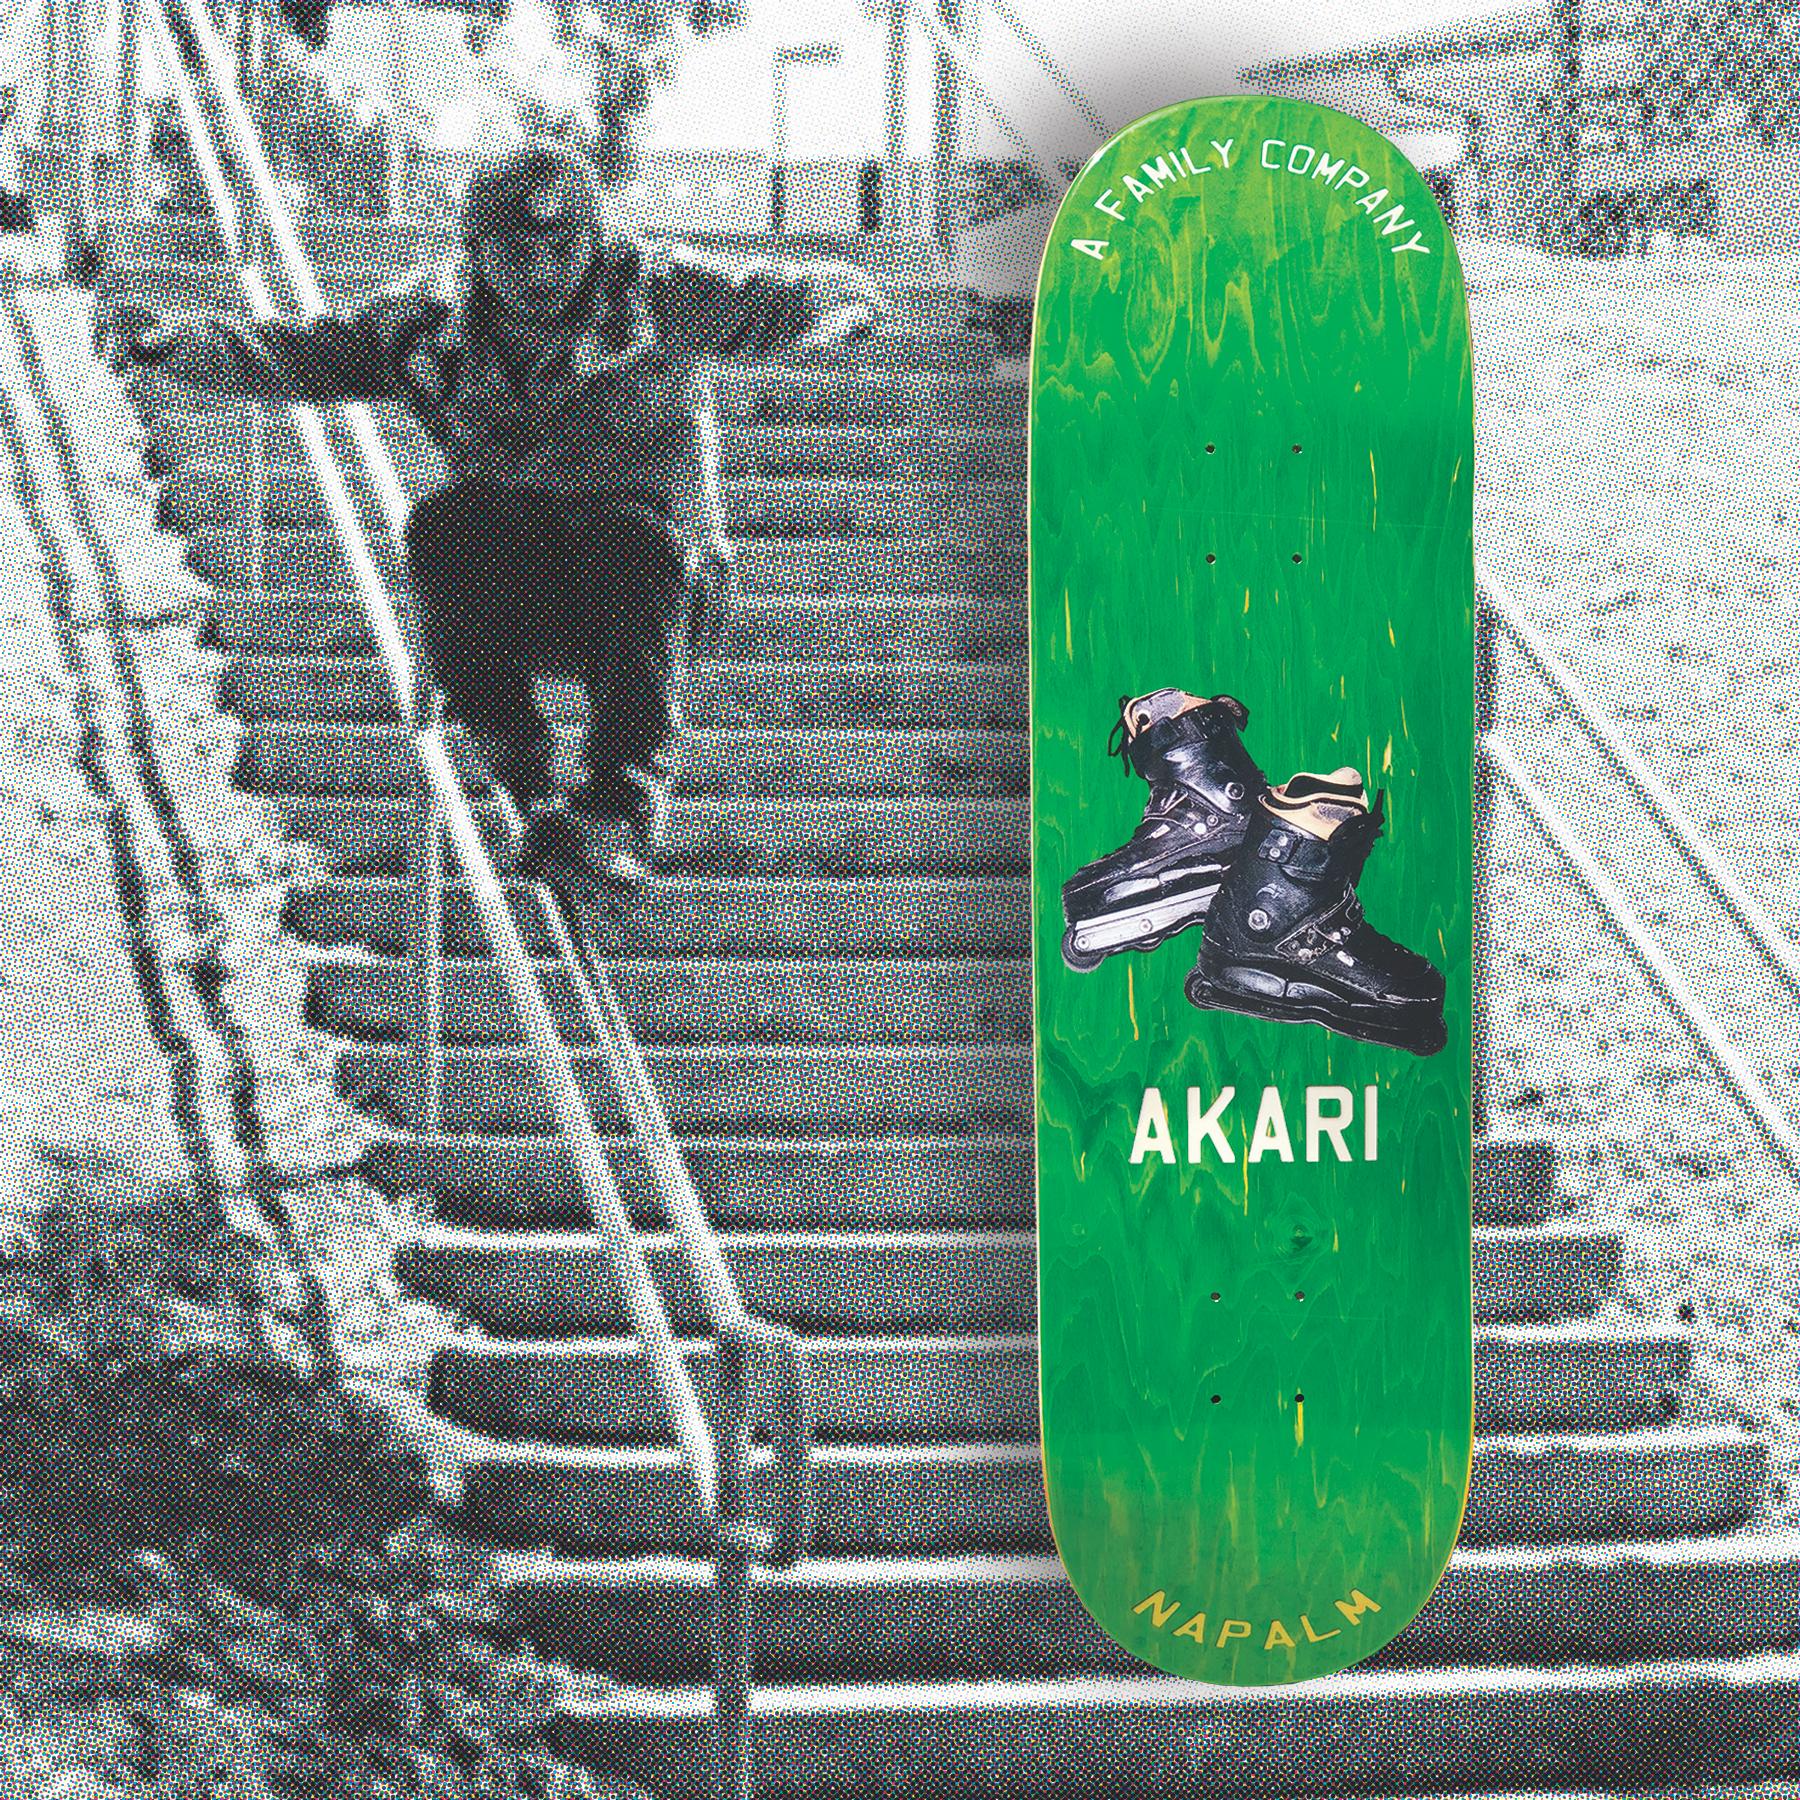 Napalm Akari Pro Deck